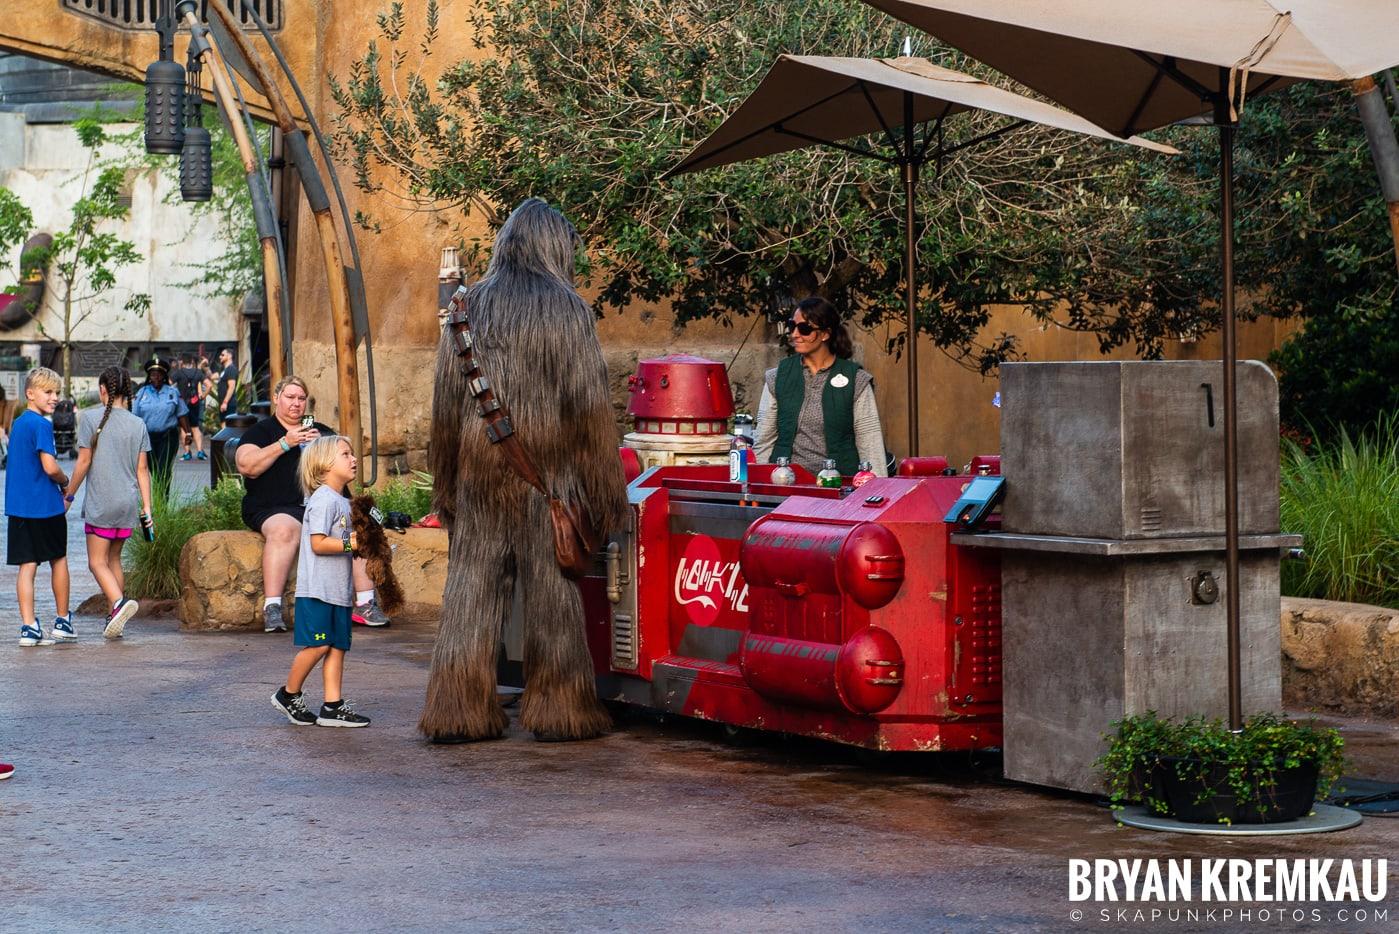 Walt Disney World Vacation: Day 3 (Disney's Hollywood Studios / Magic Kingdom) October 1st 2019 (92)